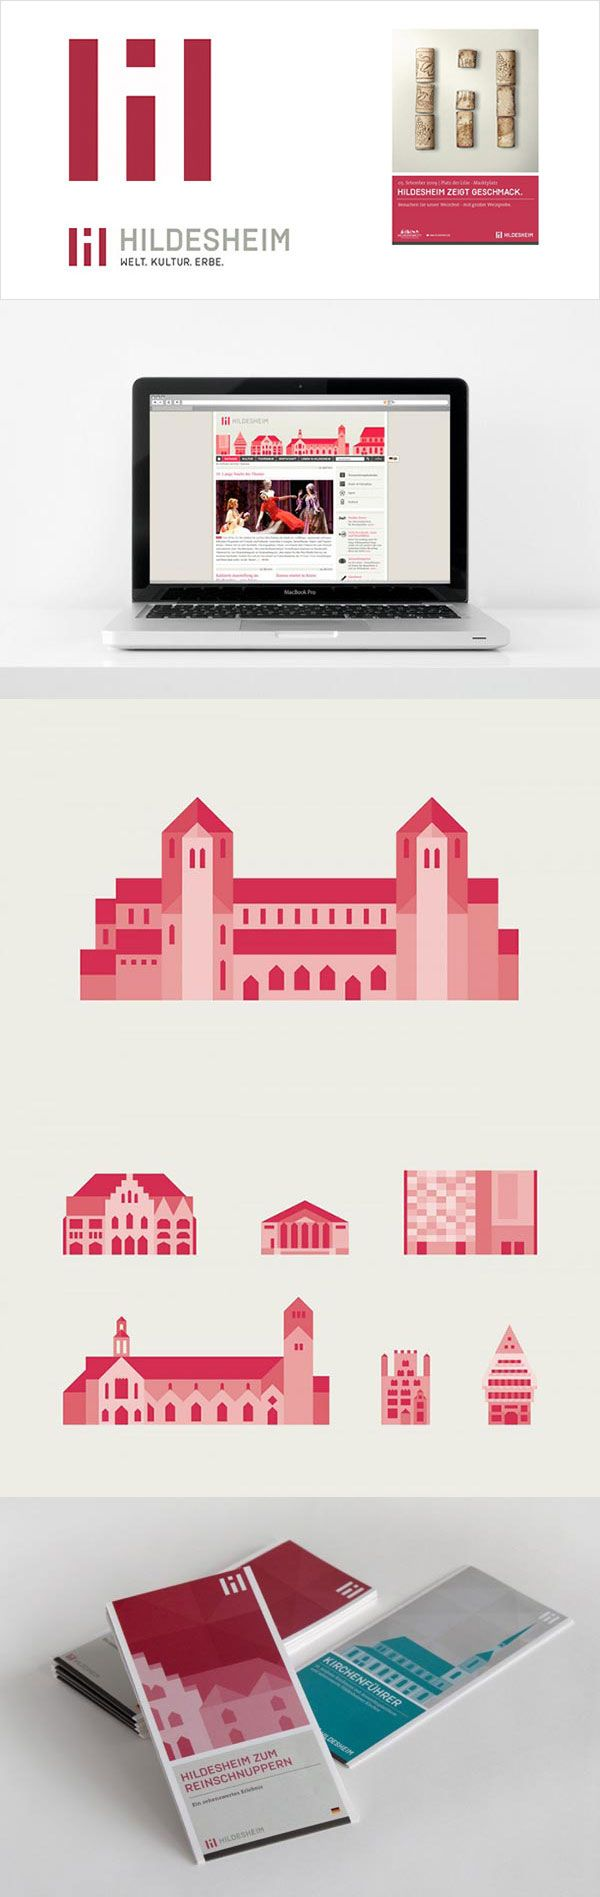 Hildesheim, Germany – logo design and corporate identity ...